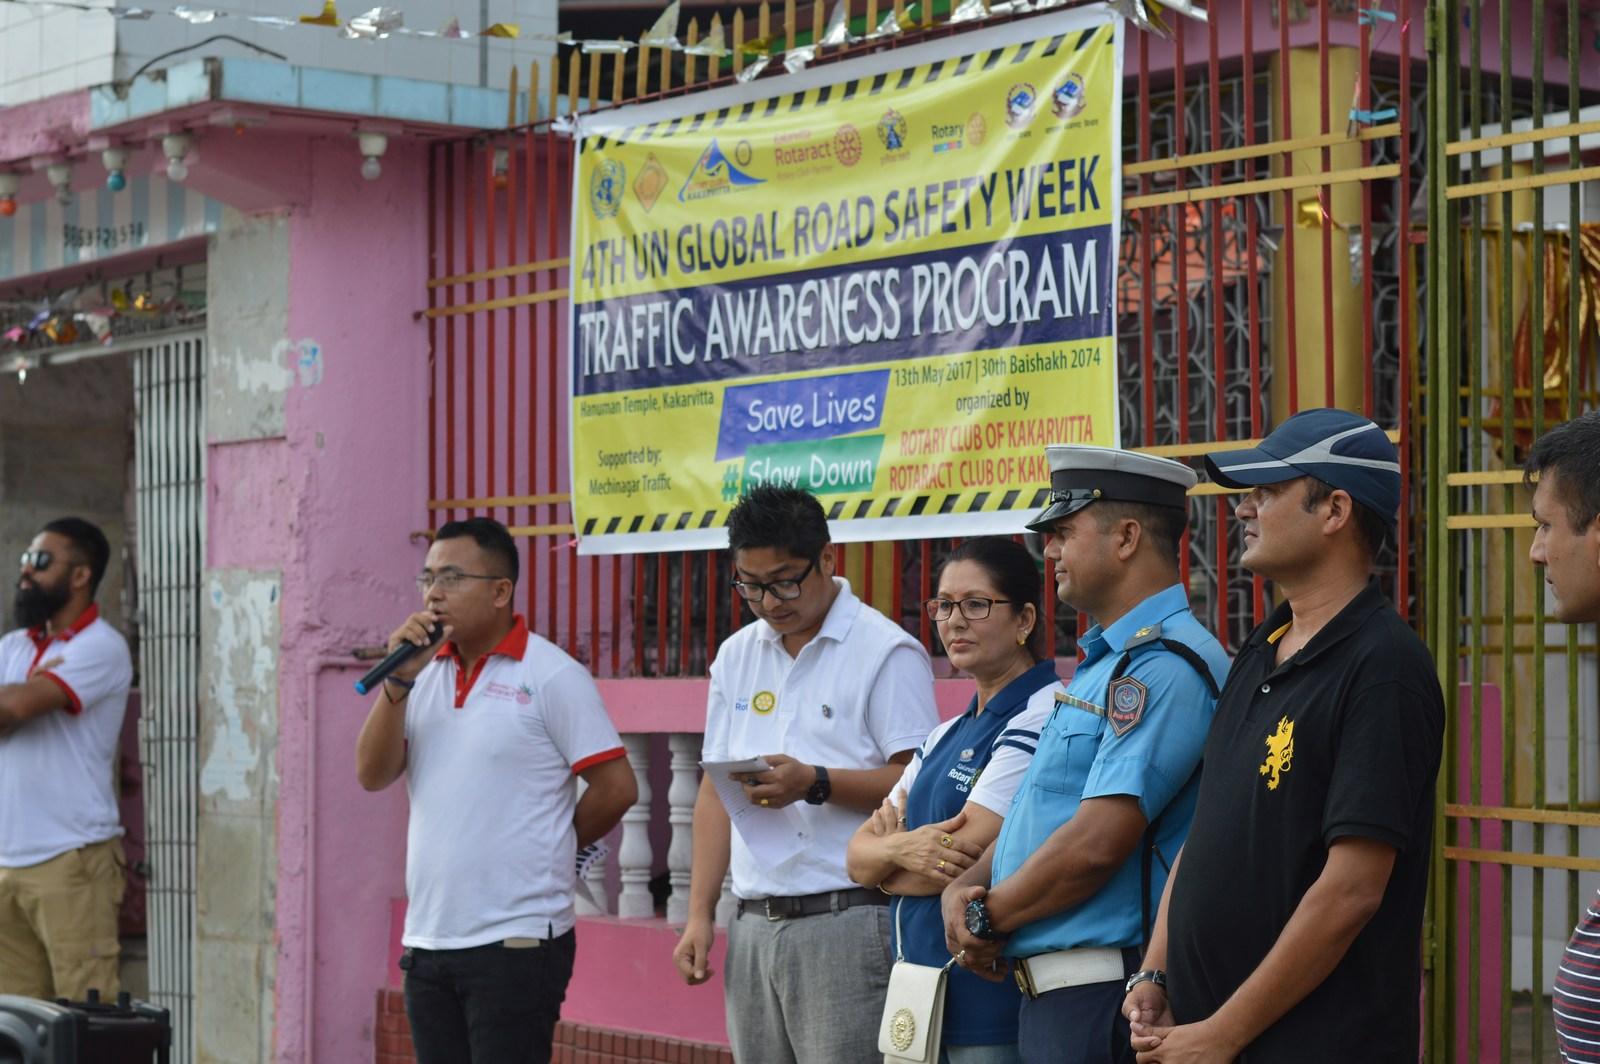 4th-UN-Global-Road-Safety-Week-2017-Traffic-Awareness-Program-Rotary-club-of-Kakarvitta-13